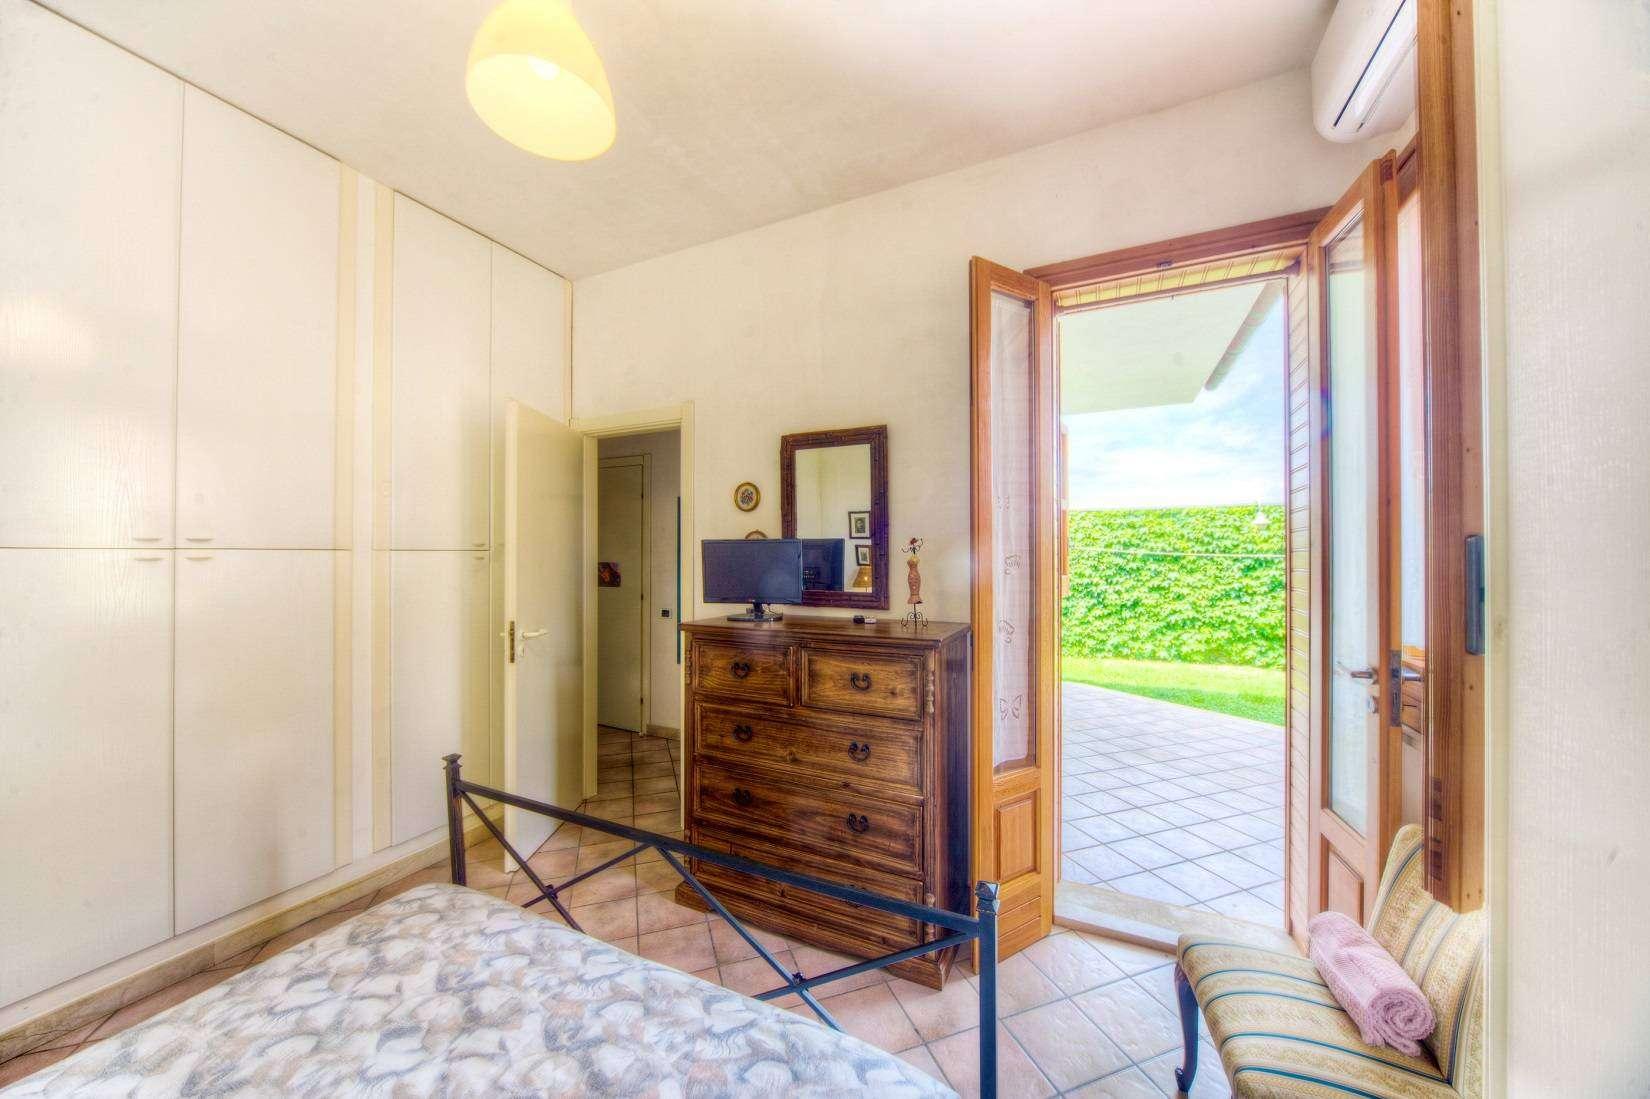 13 Brucarella Double bedroom